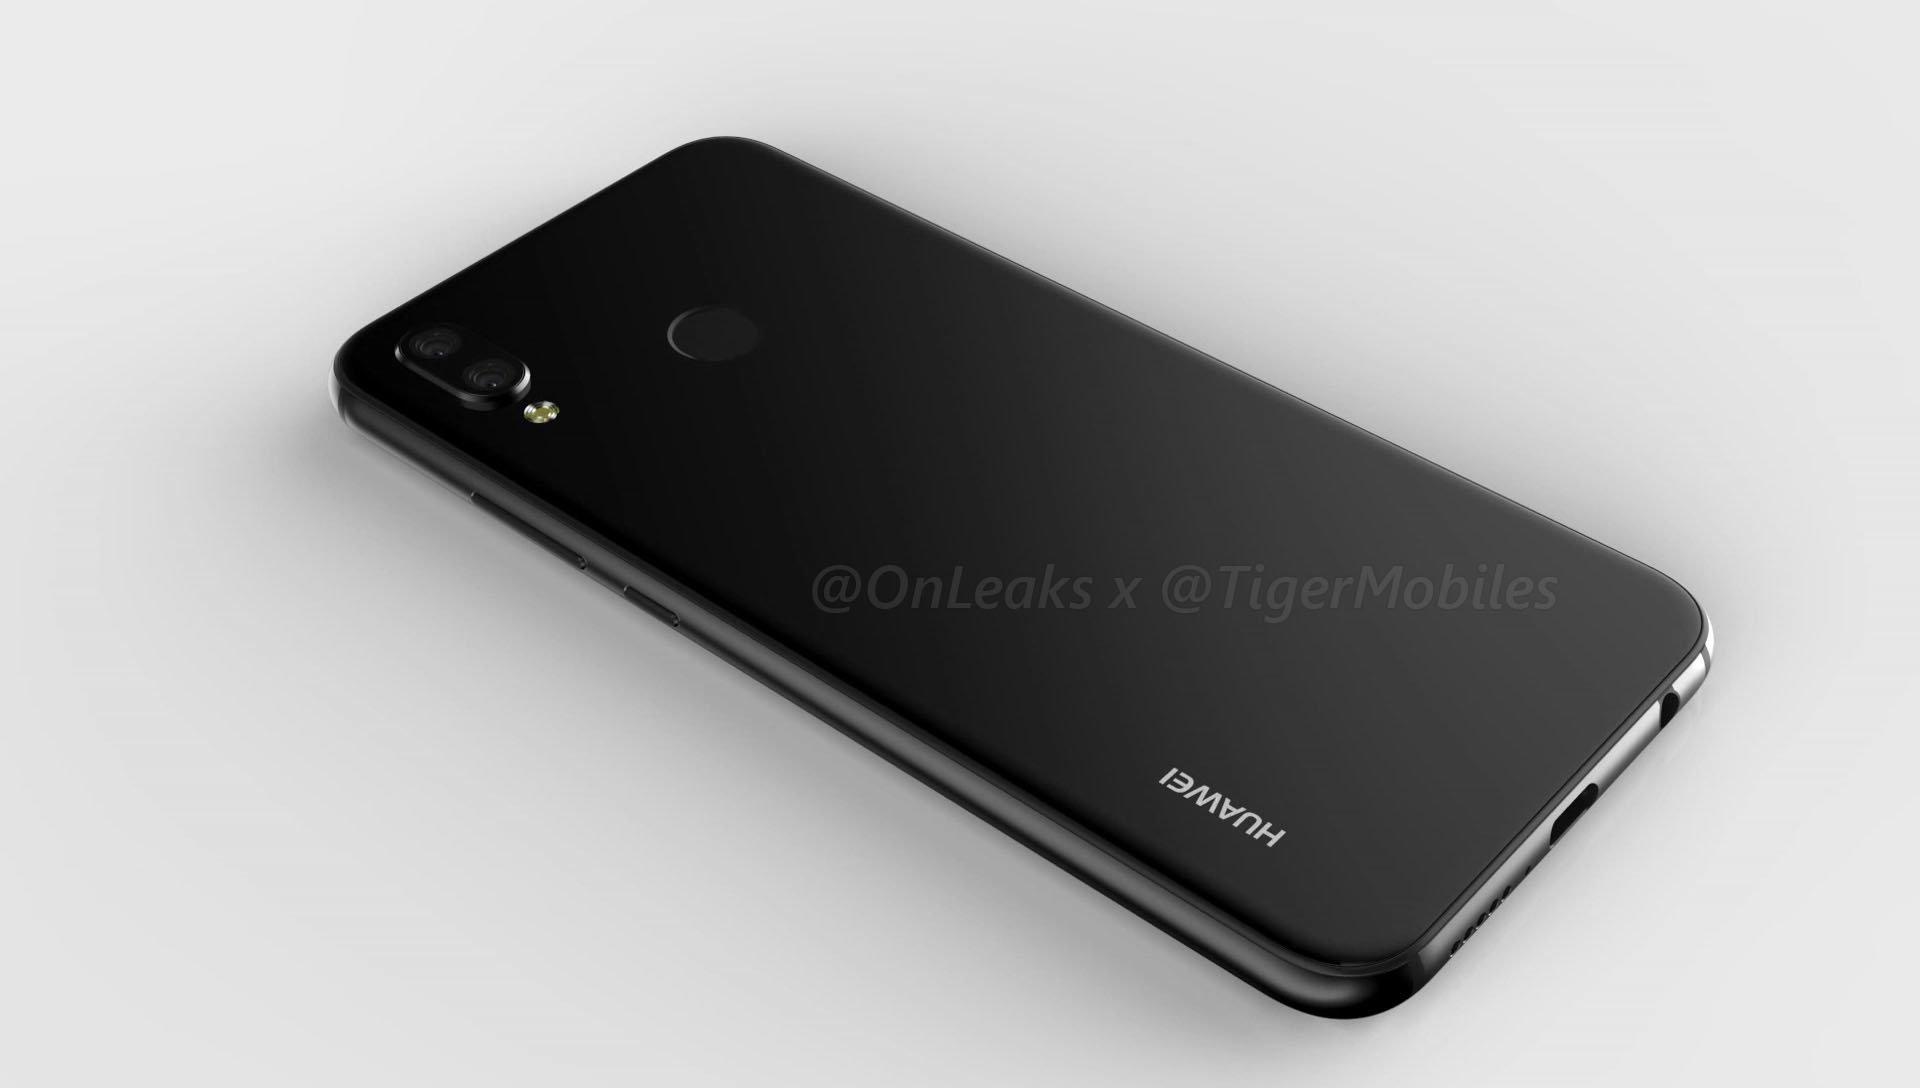 Huawei Lite Fot Onleaks Tigermobiles 06 Mate Pro Jest